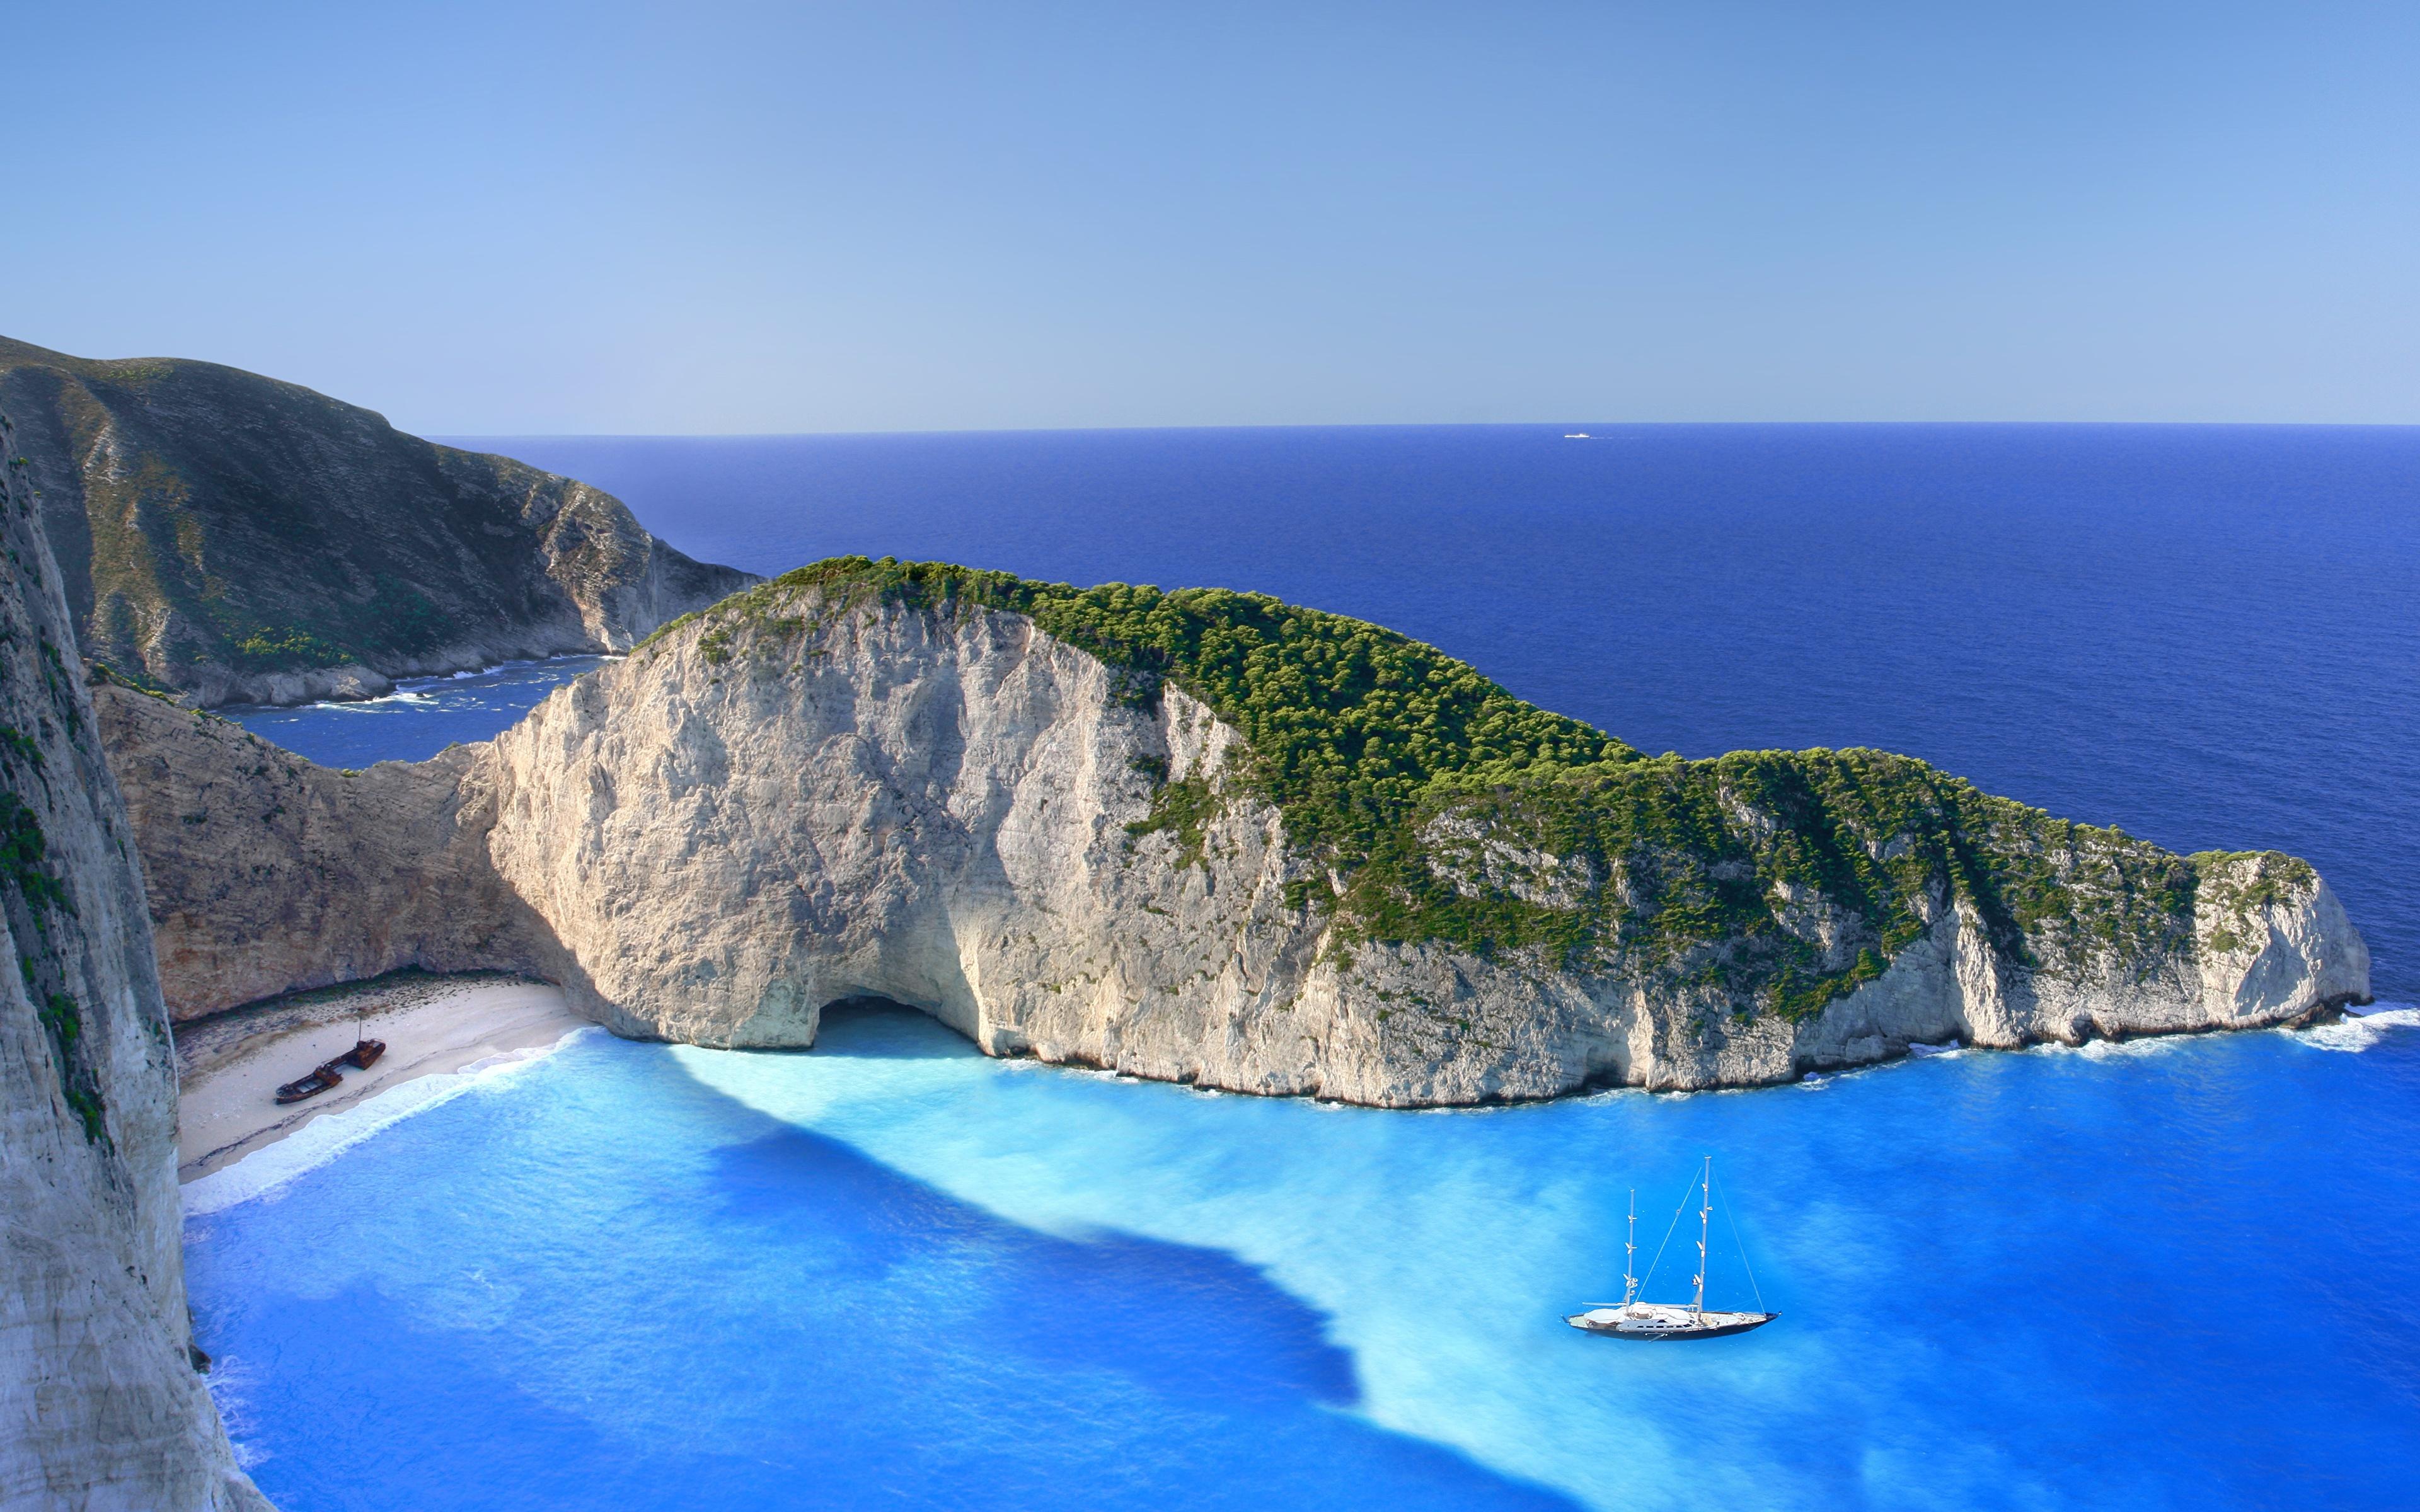 Images Greece Zakynthos Navagio Sea Crag Nature Cove 3840x2400 3840x2400